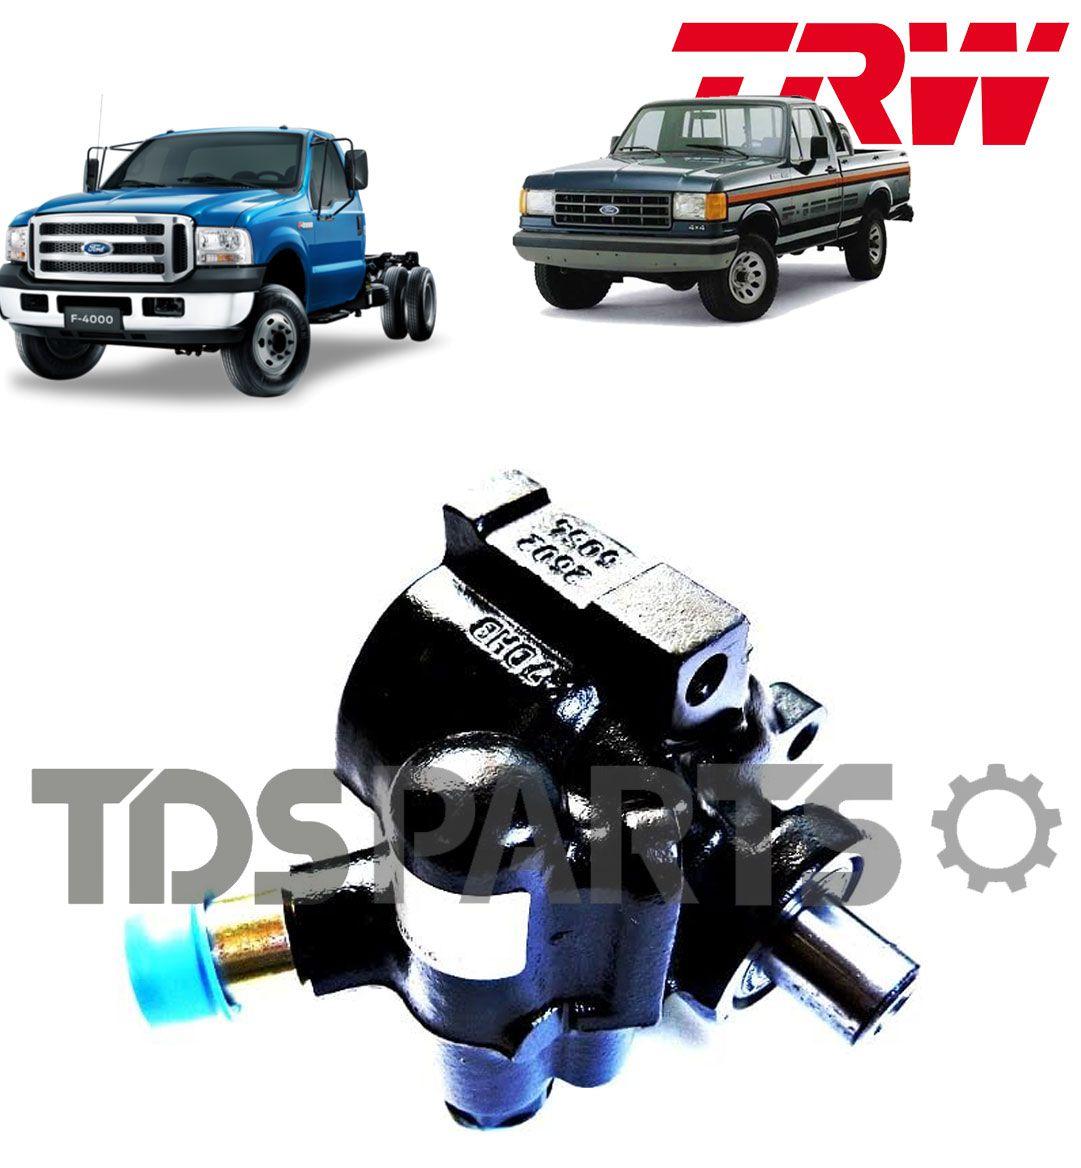 Bomba De Direção Hidráulica  TRW Ford F1000 | F4000  (Motor MWM)